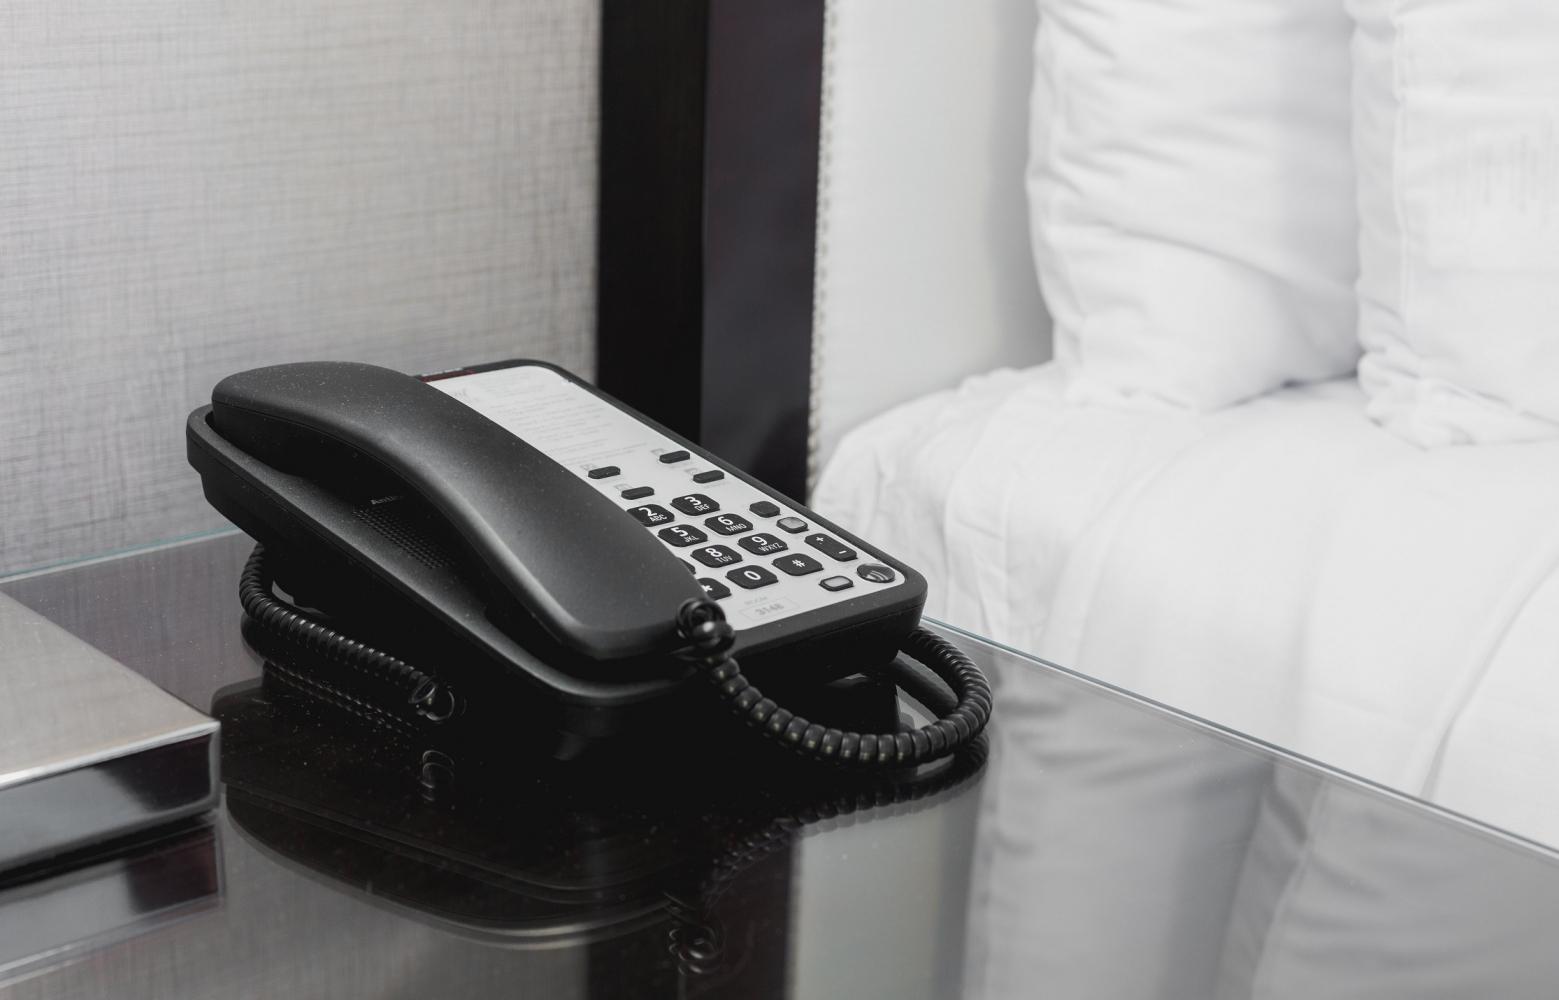 hotel-room-phone_4460x4460